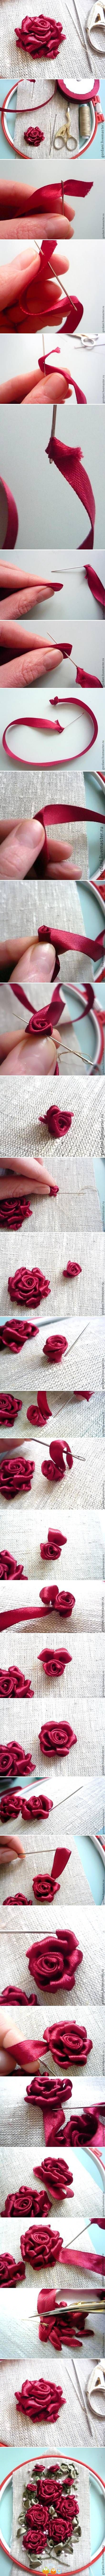 Broderie aux rubans : superbes roses !